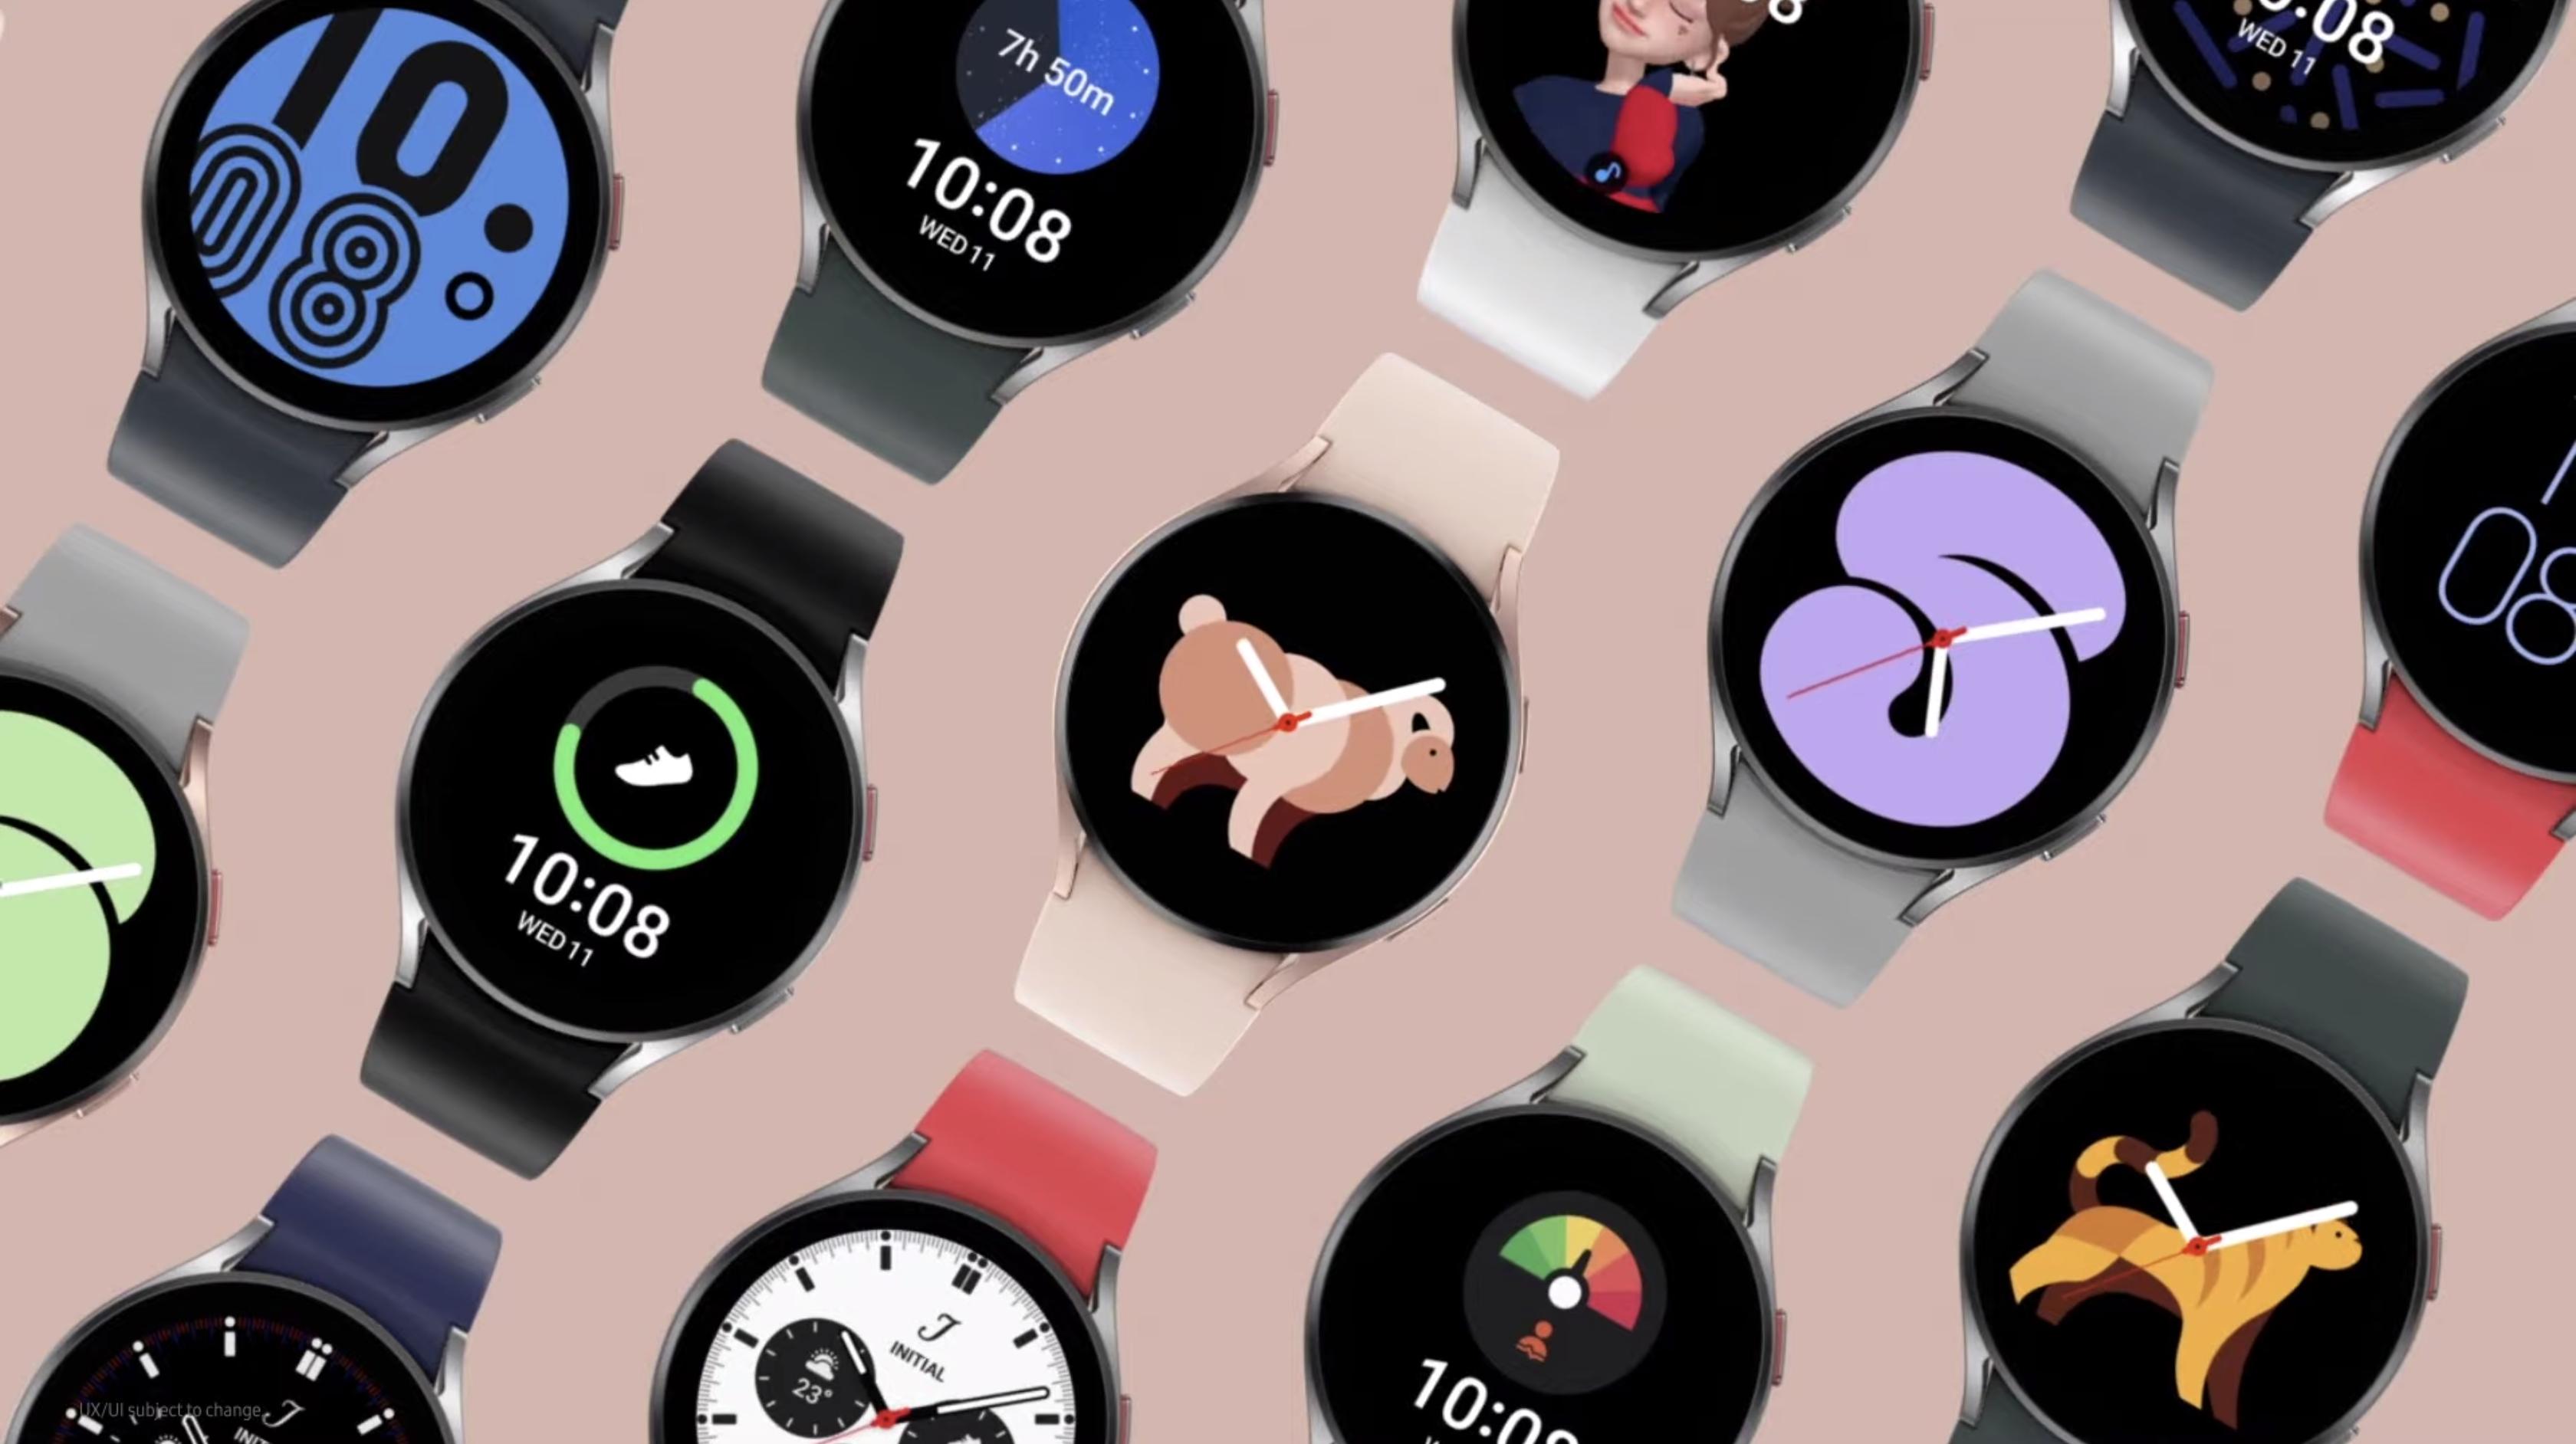 Samsung Galaxy Watch 4 at Unpacked 2021